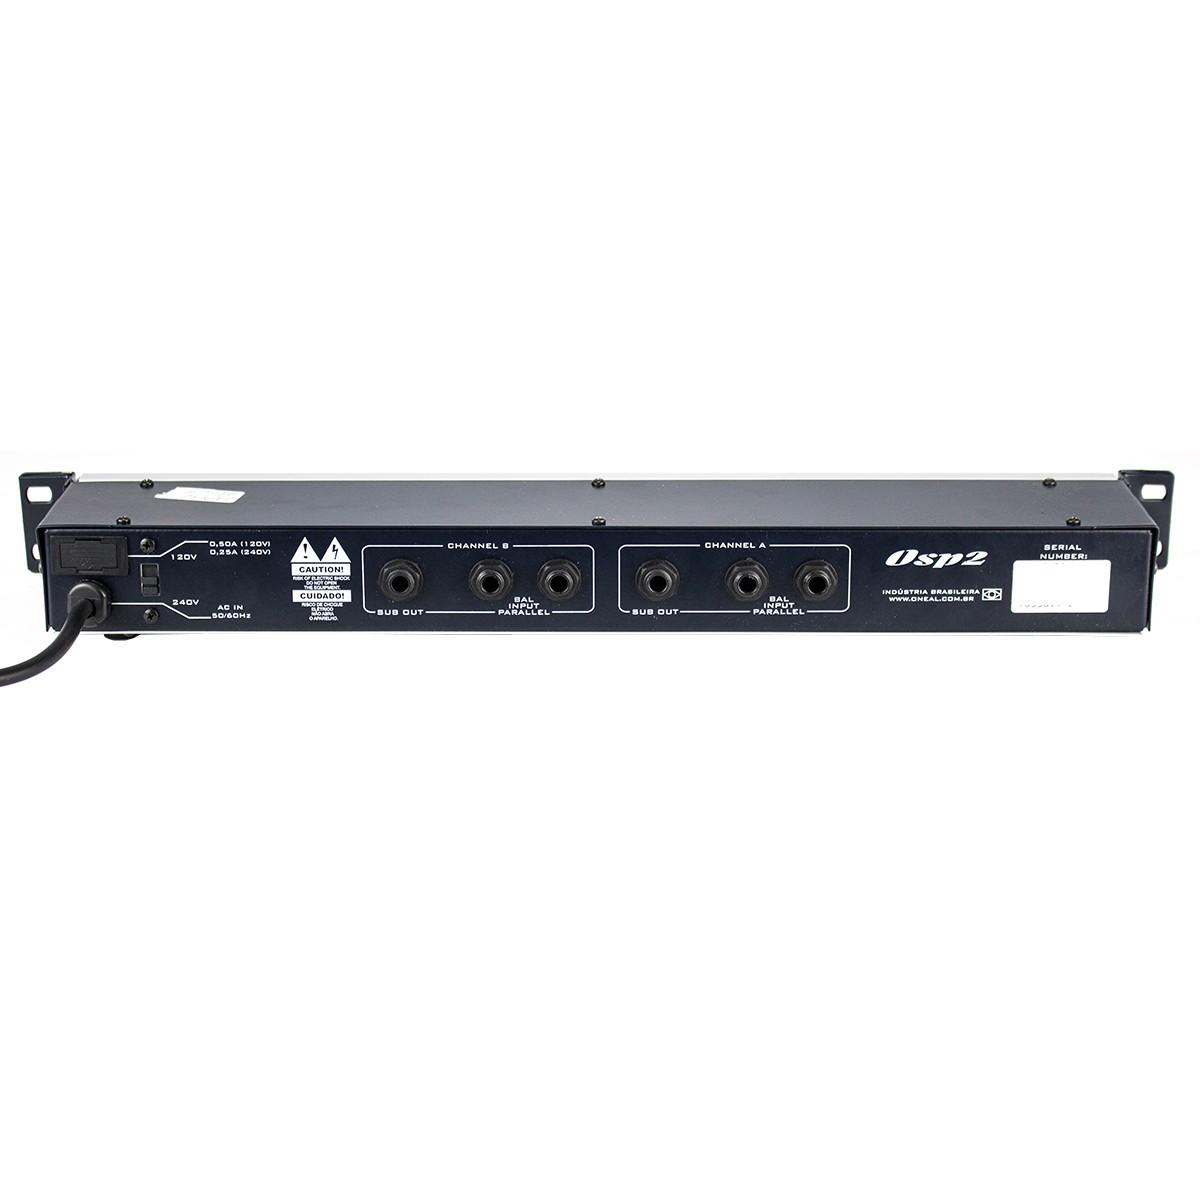 OSP2 - Crossover Analógico 2 Canais OSP 2 - Oneal